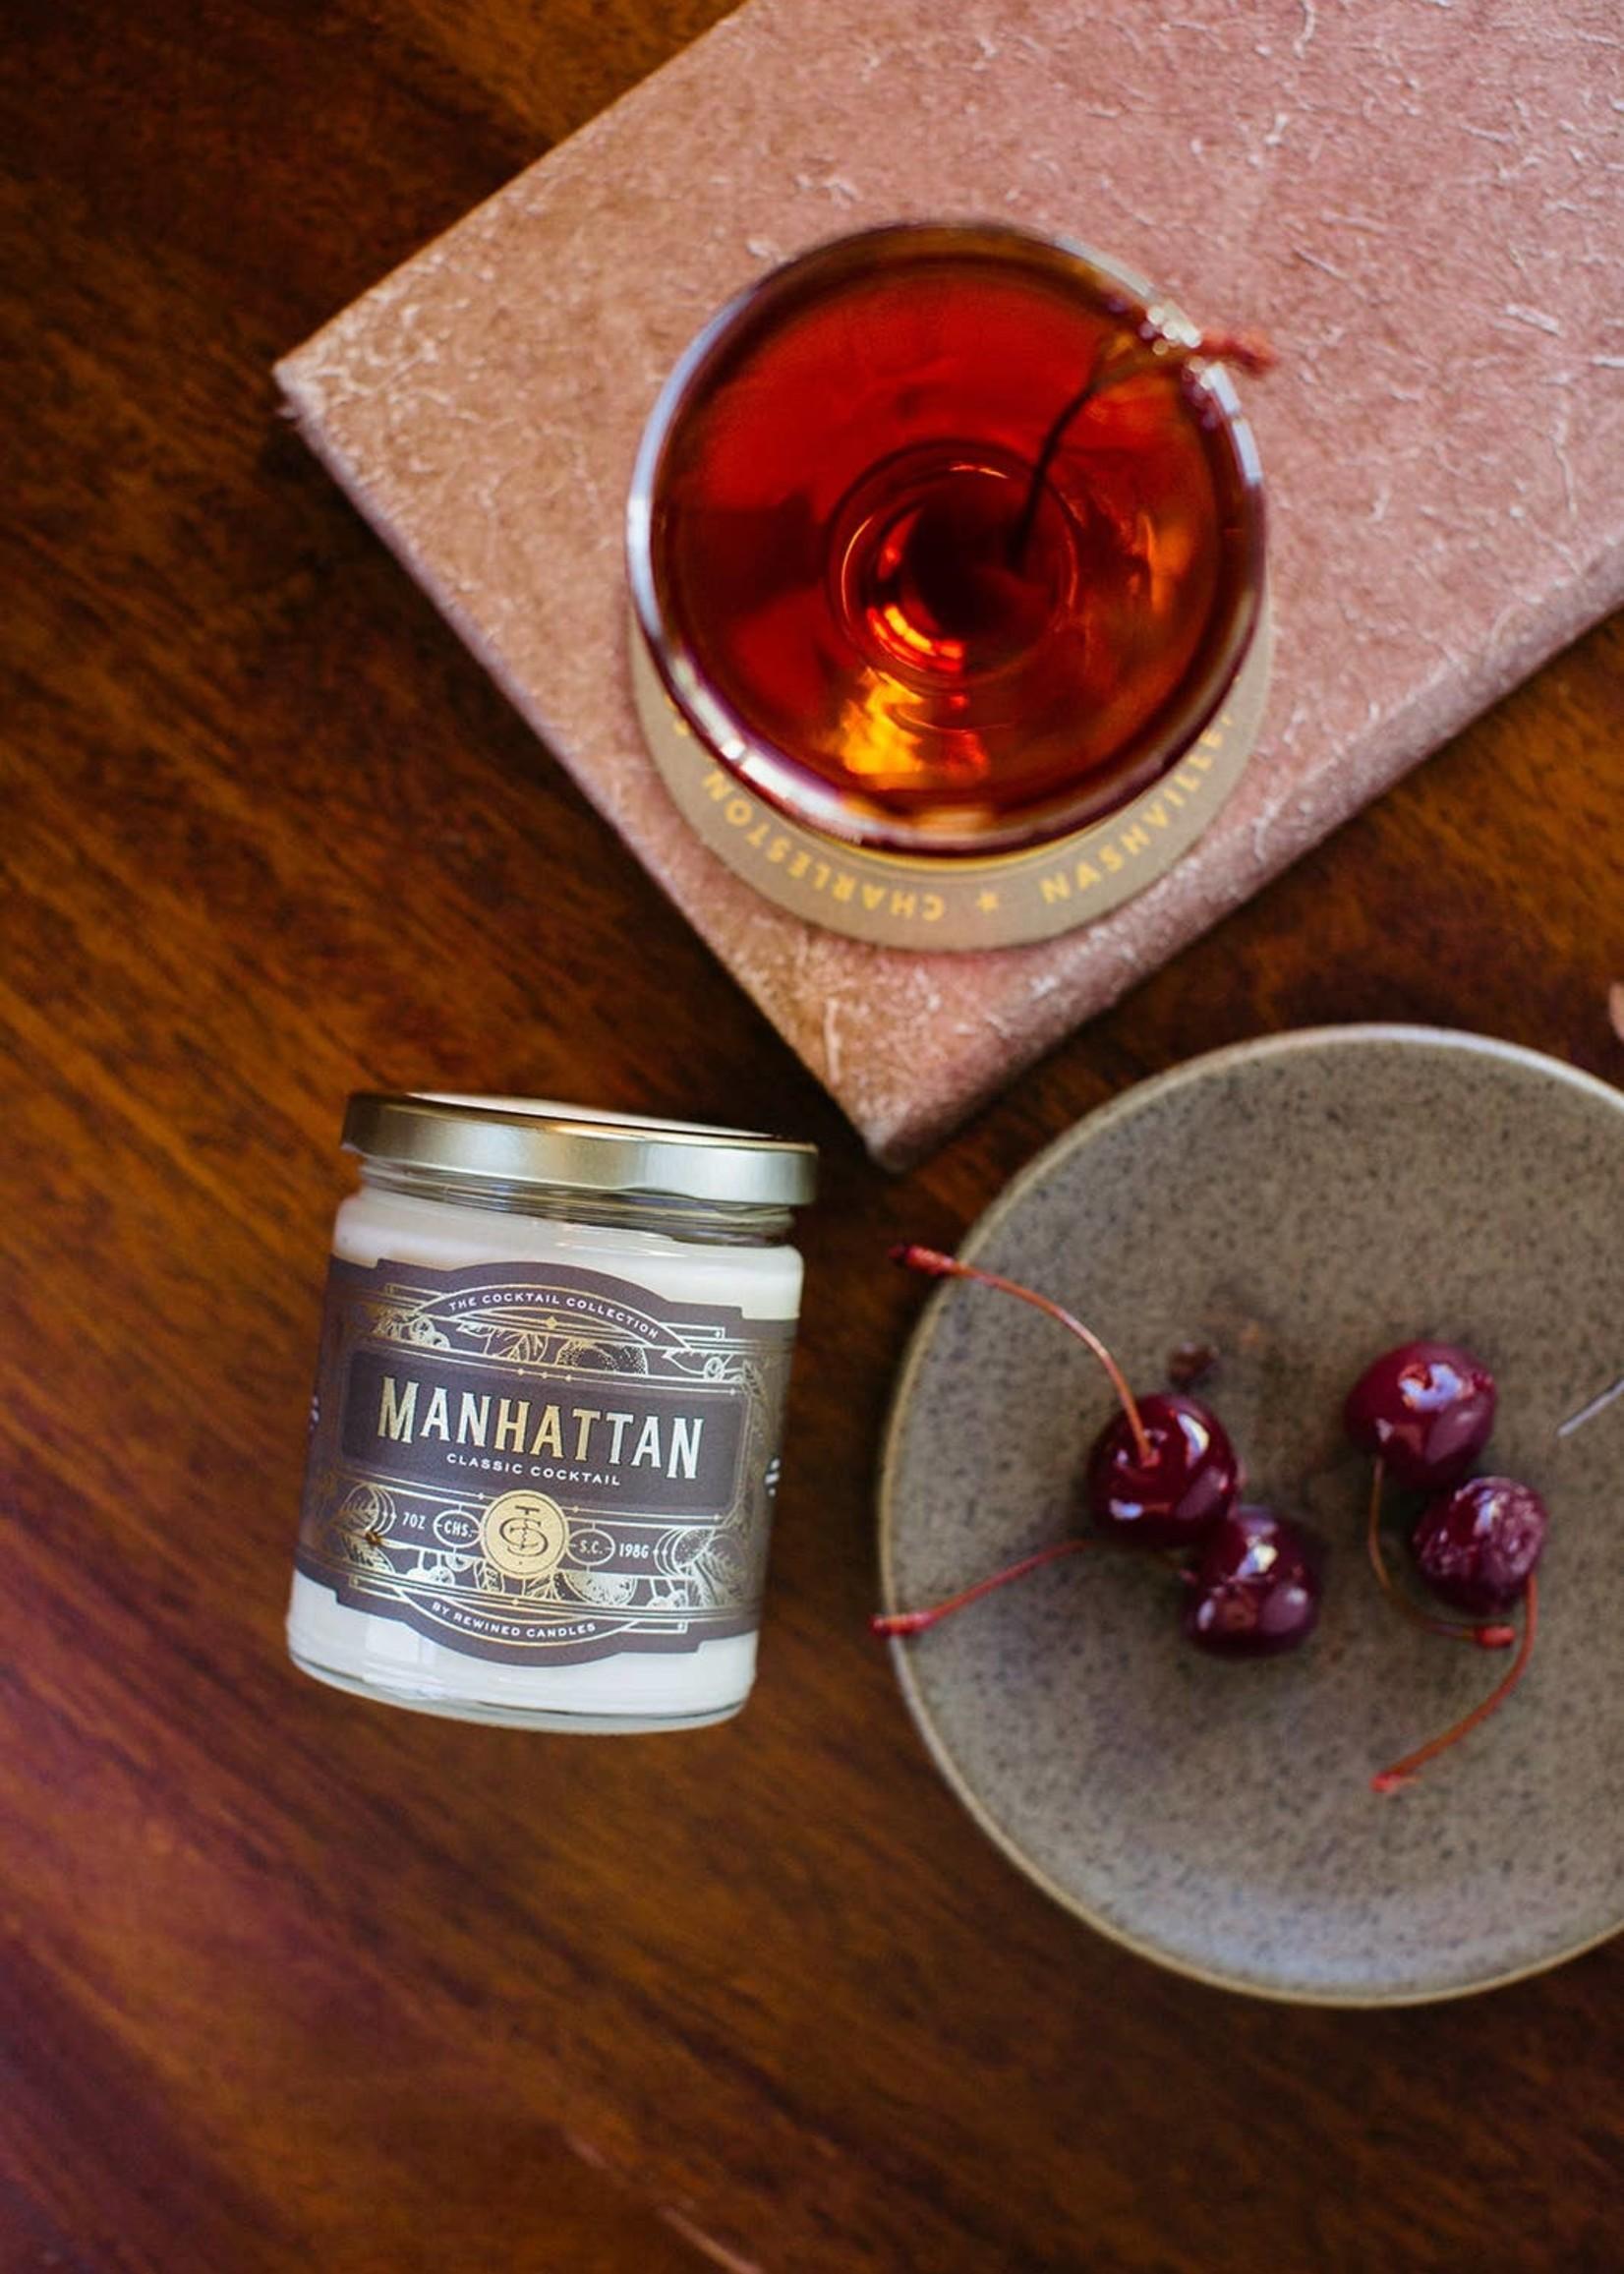 Rewined Manhattan Candle (7 oz)